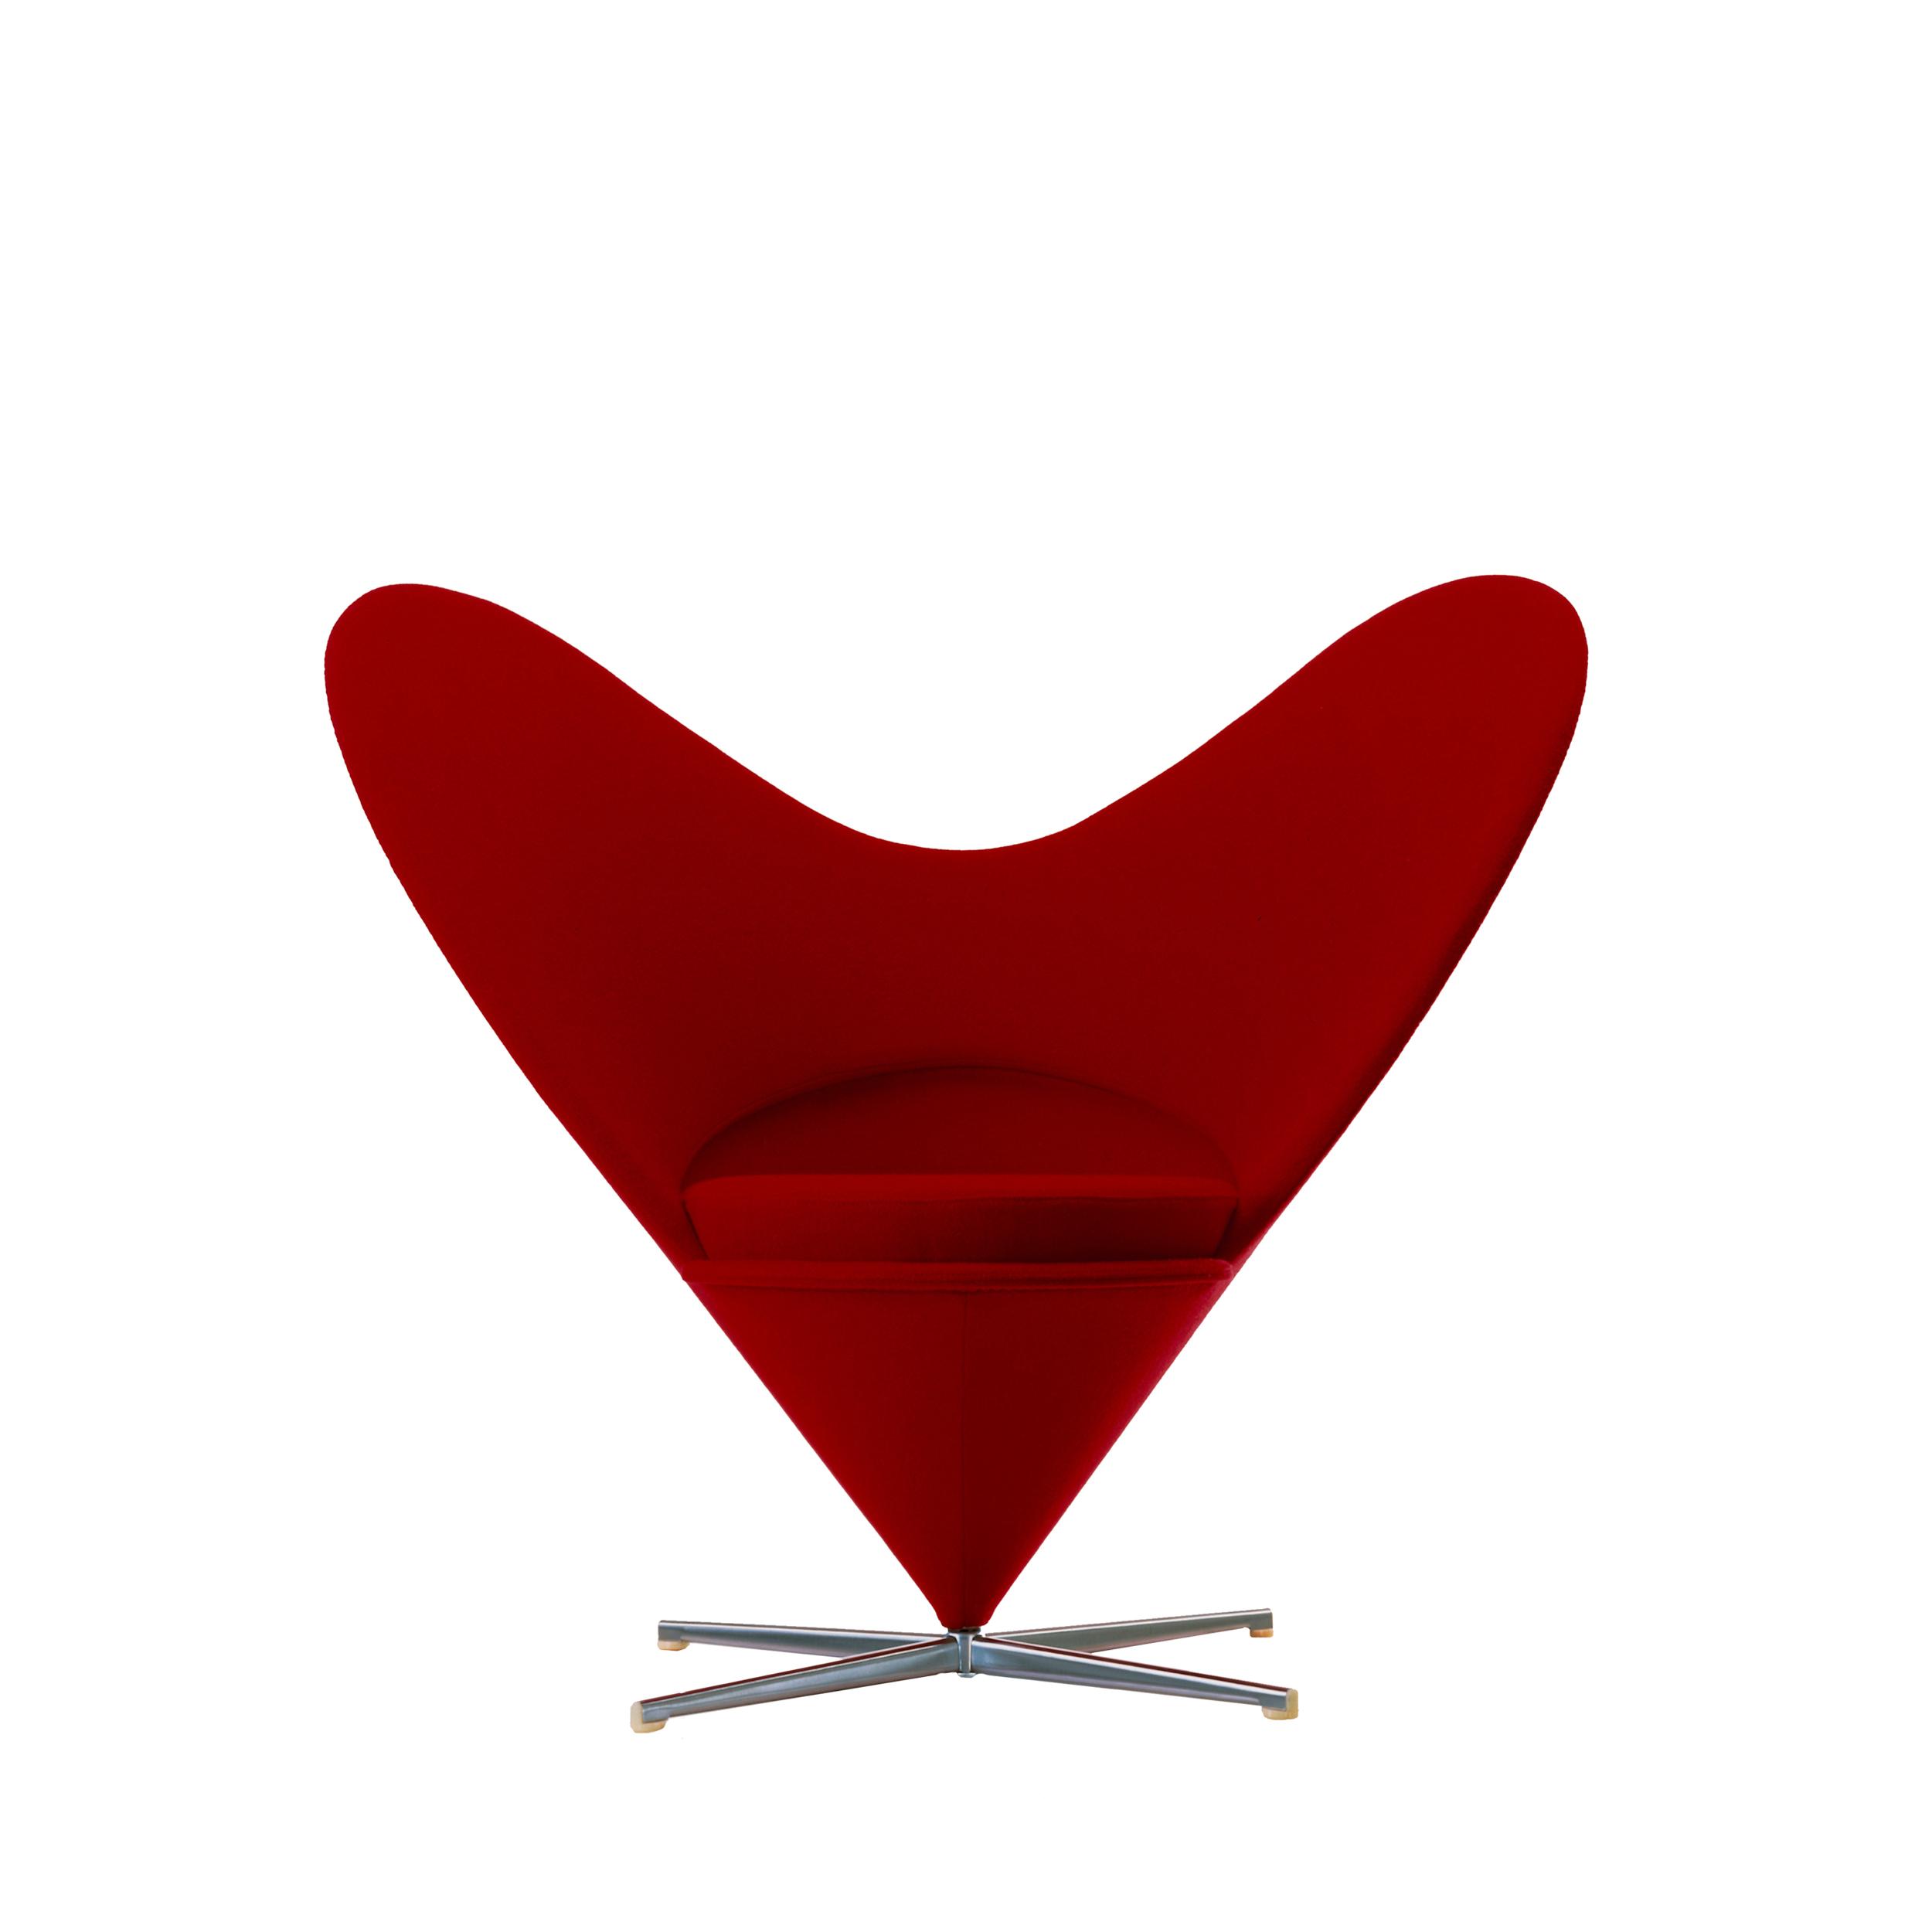 vitra sessel heart cone chair von verner panton. Black Bedroom Furniture Sets. Home Design Ideas